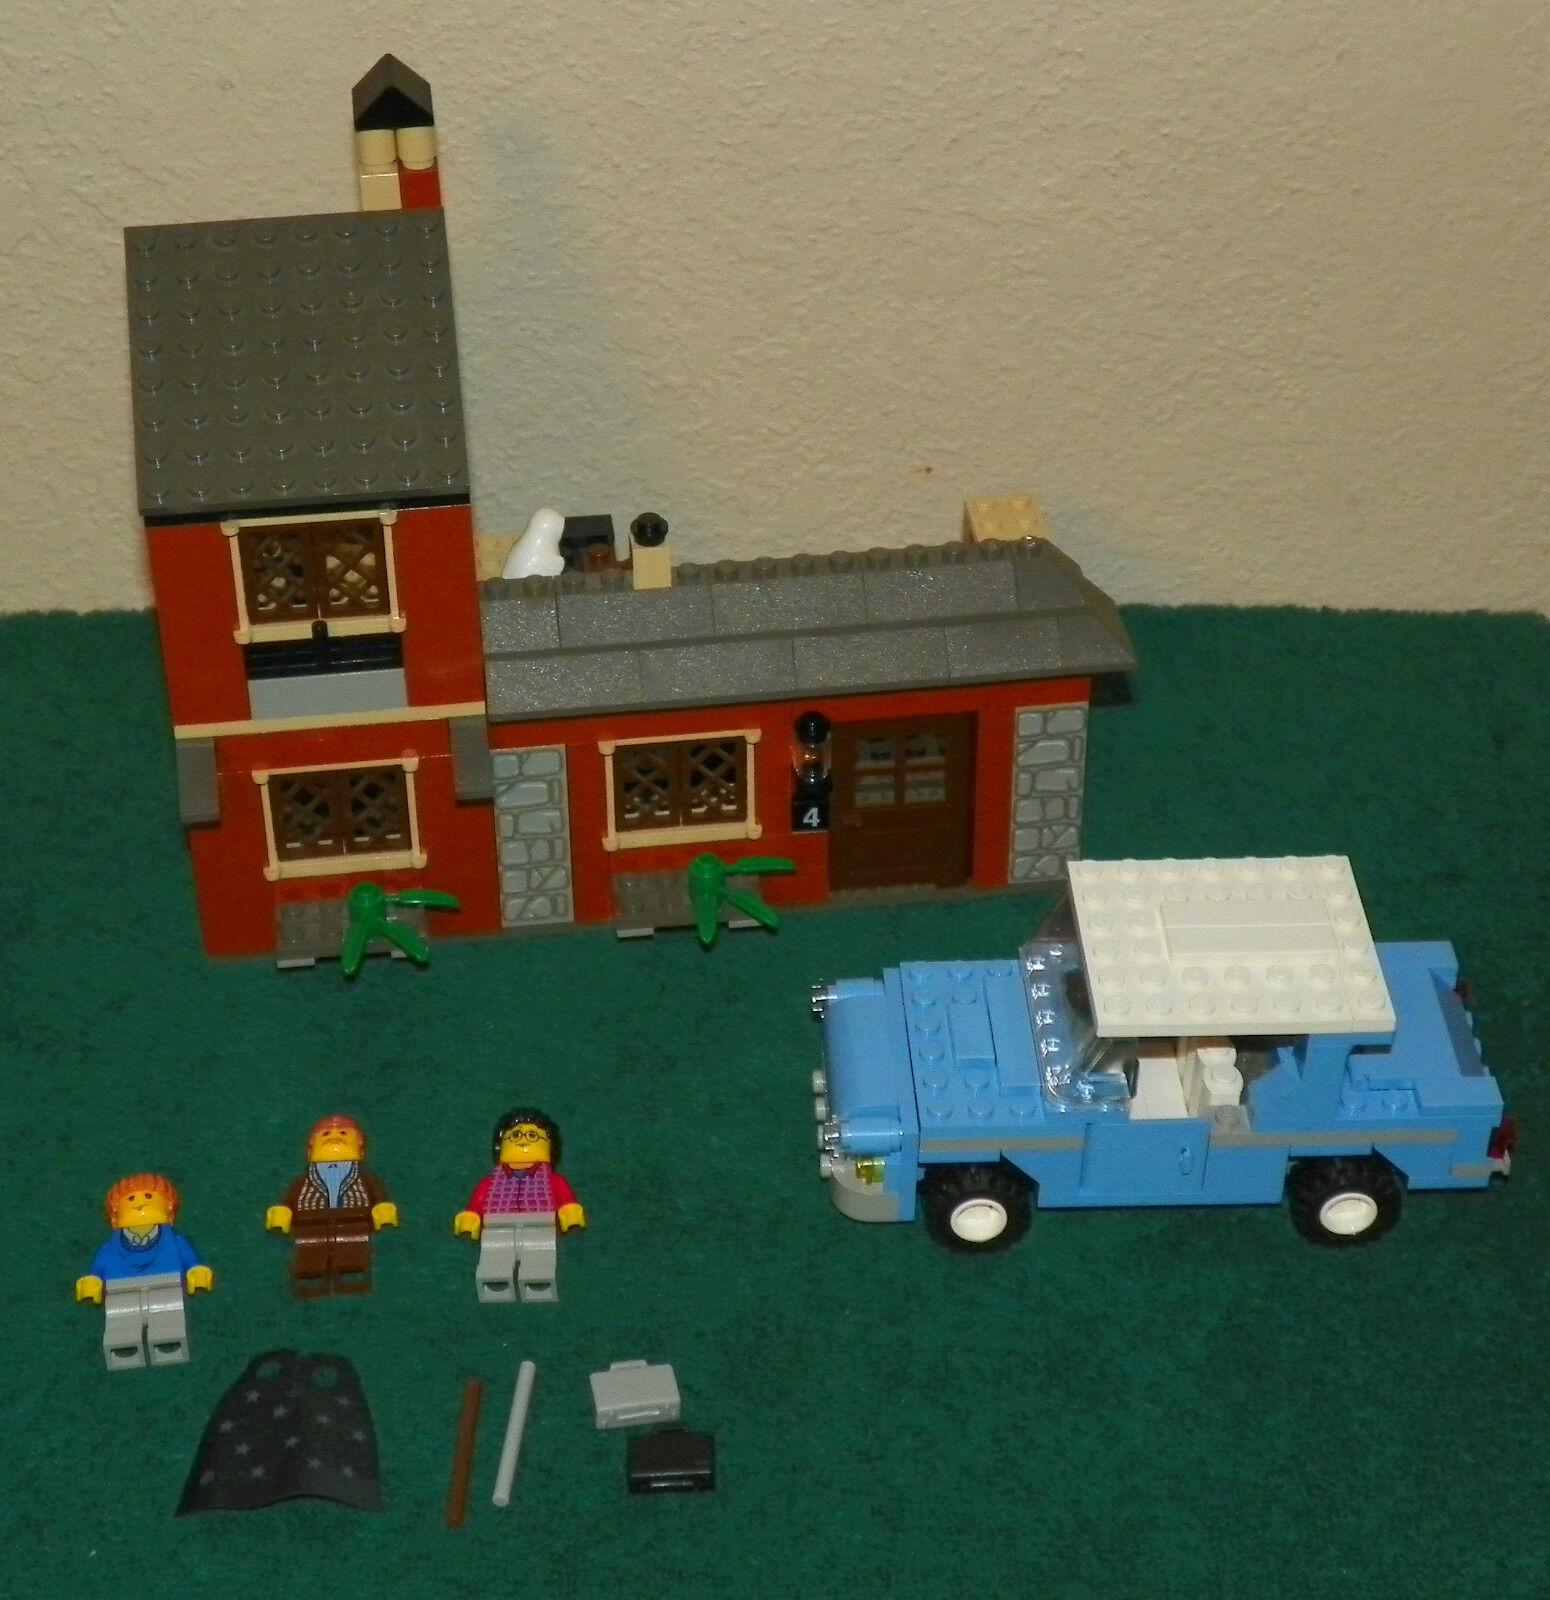 LEGO 4728 - HARRY POTTER - ESCAPE FROM PRIVET DRIVE - 2002 - NO BOX